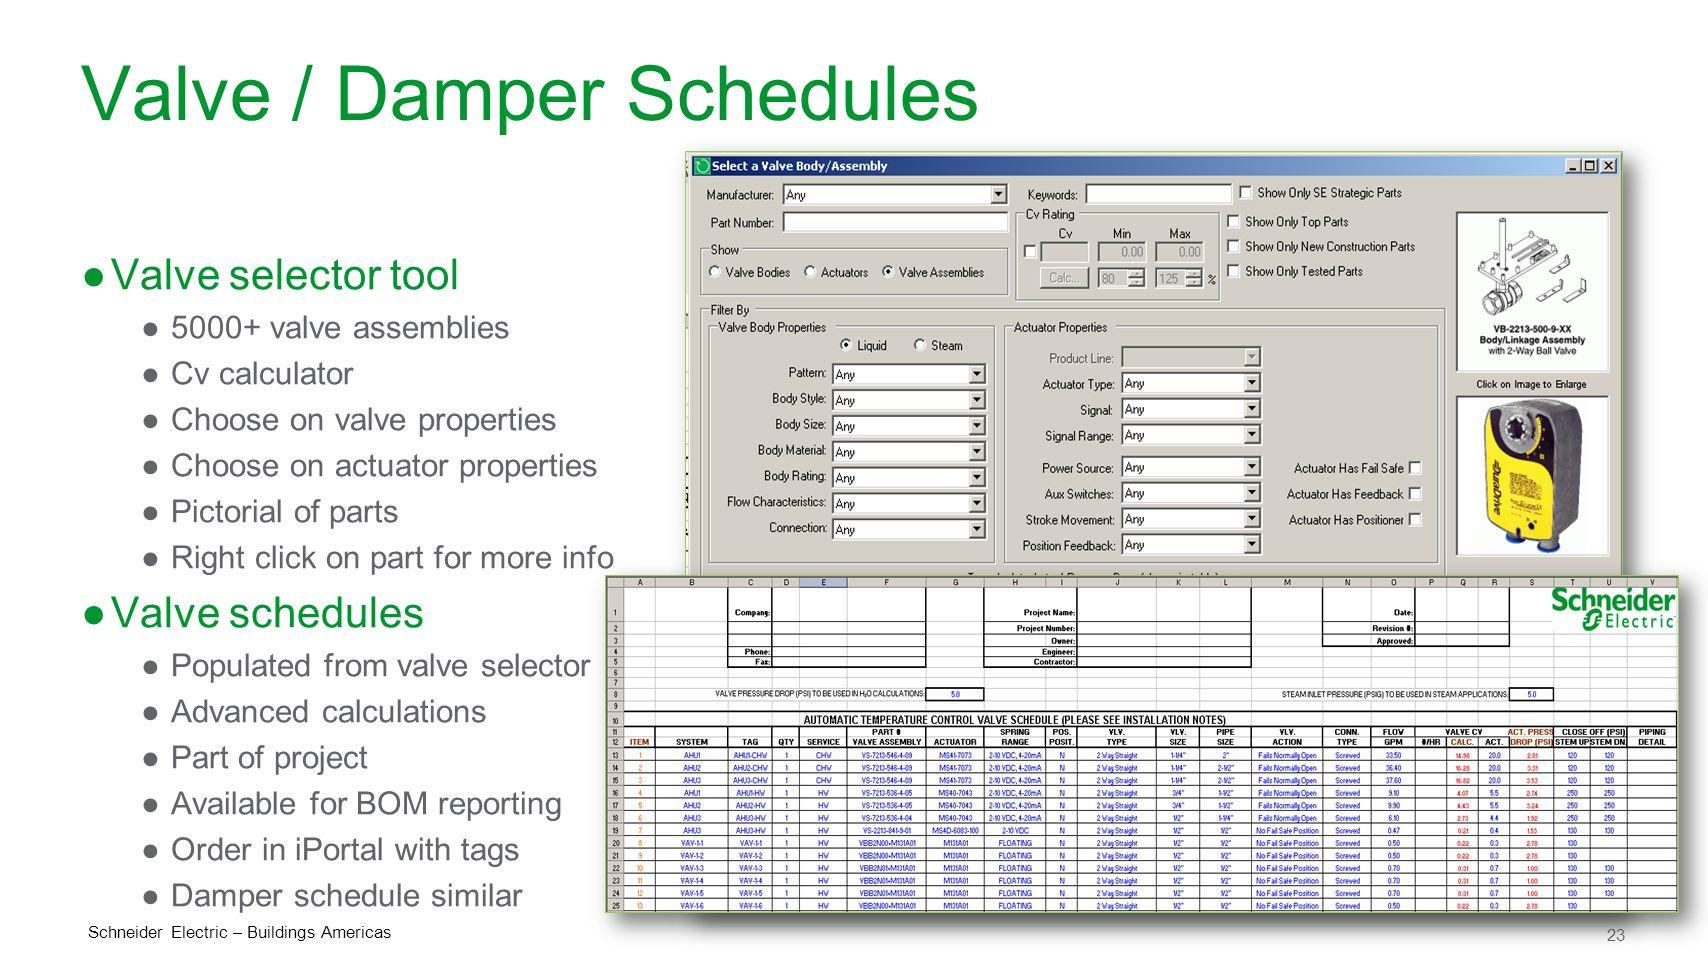 23 Schneider Electric – Buildings Americas Valve / Damper Schedules ●Valve selector tool ●5000+ valve assemblies ●Cv calculator ●Choose on valve prope